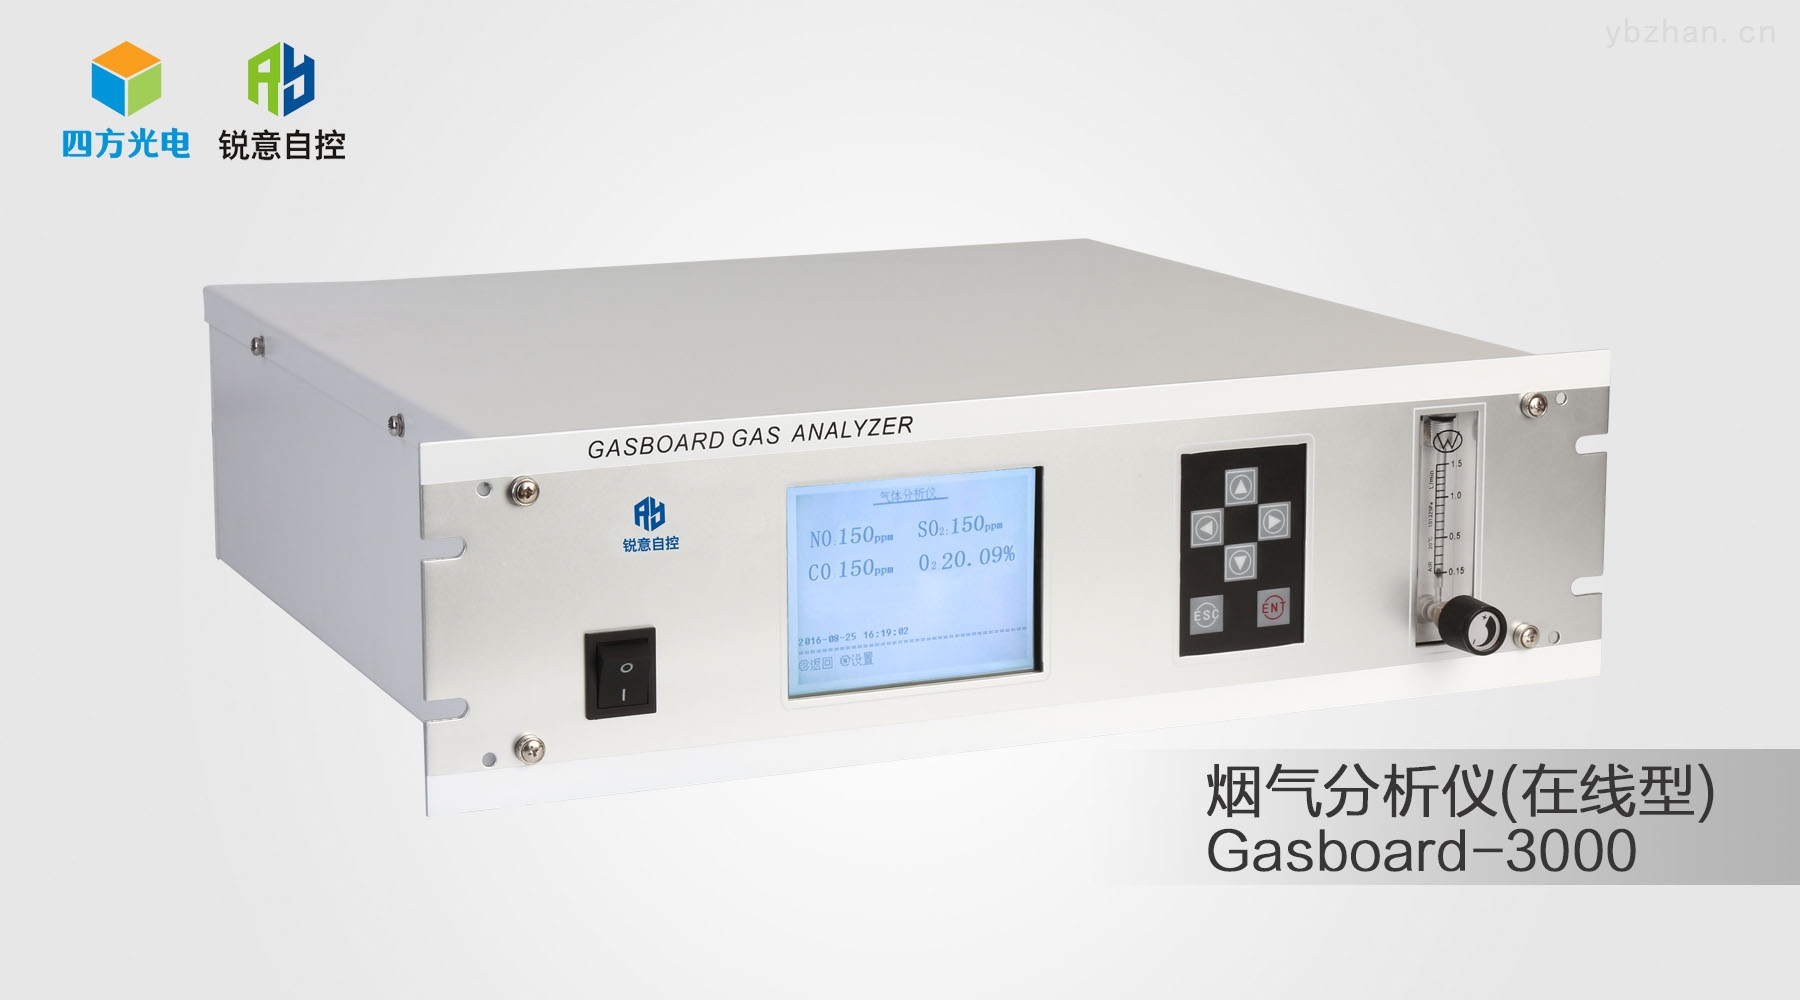 Gasboard-3000-銳意自控在線紅外煙氣分析儀Gasboard-3000